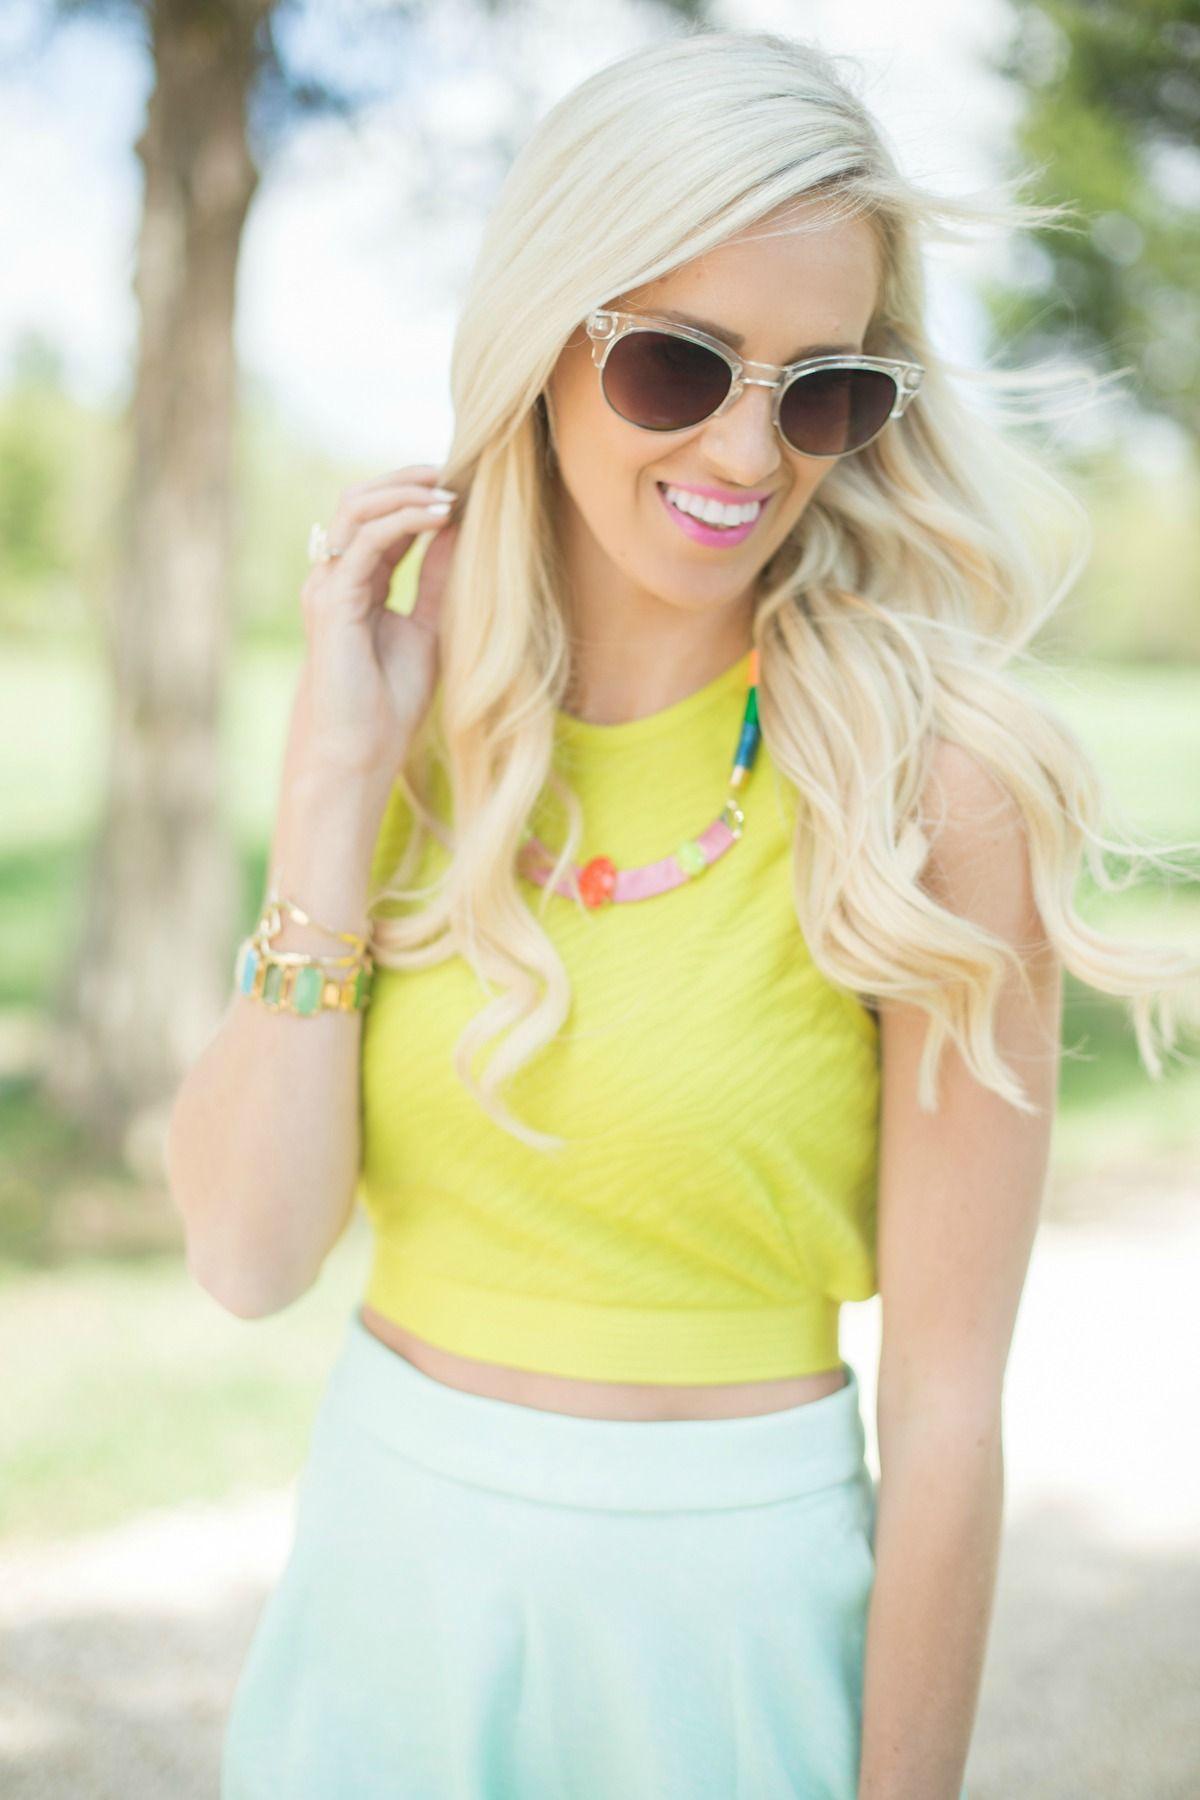 McKenna_Bleu_Fashion_Style_Blog_Blogger_Spring_DC_photo-142